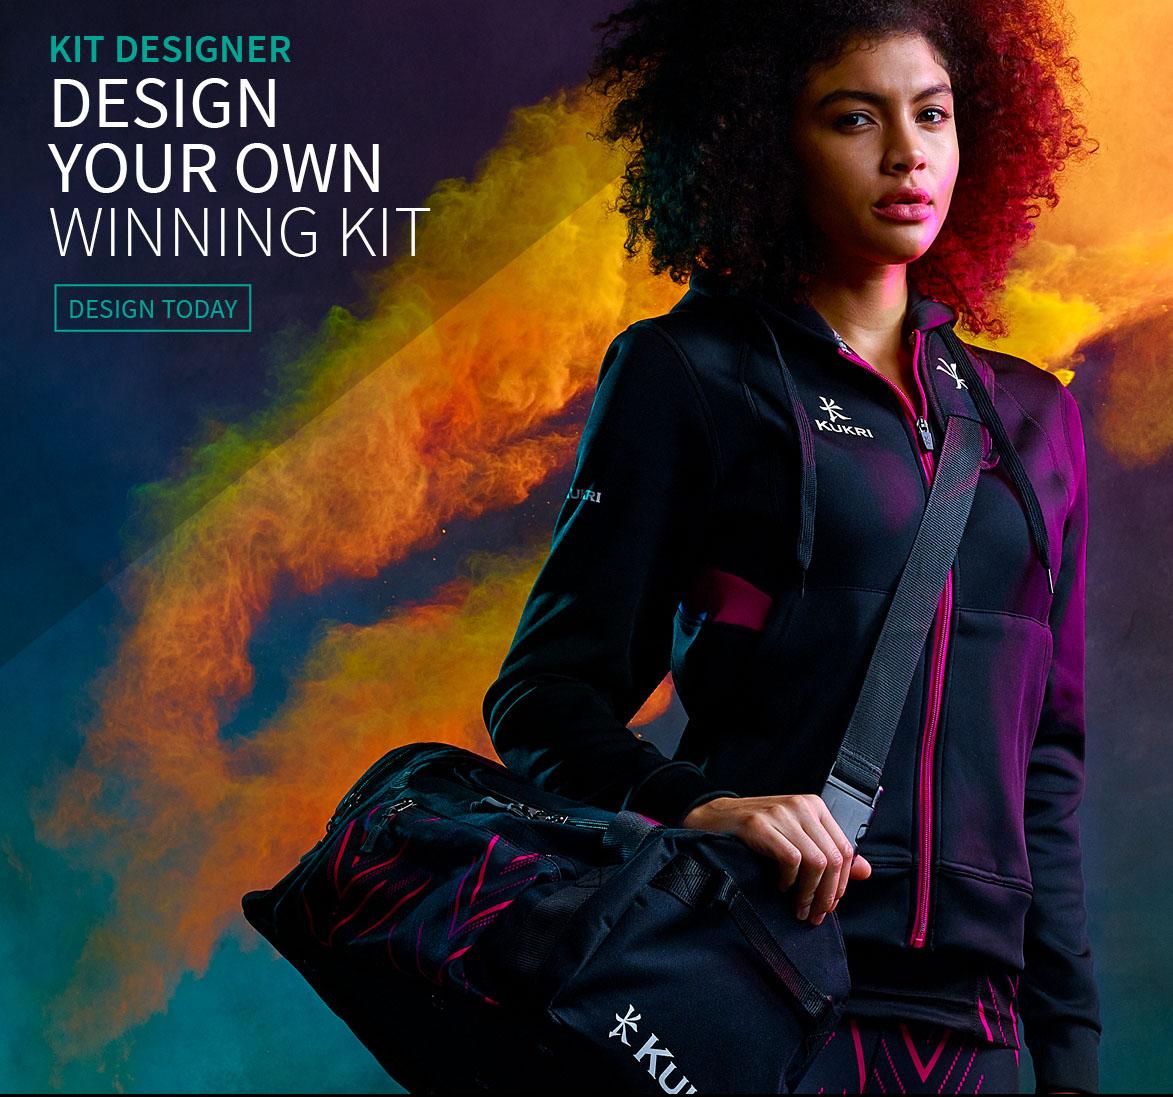 Design your own with kitdesigner